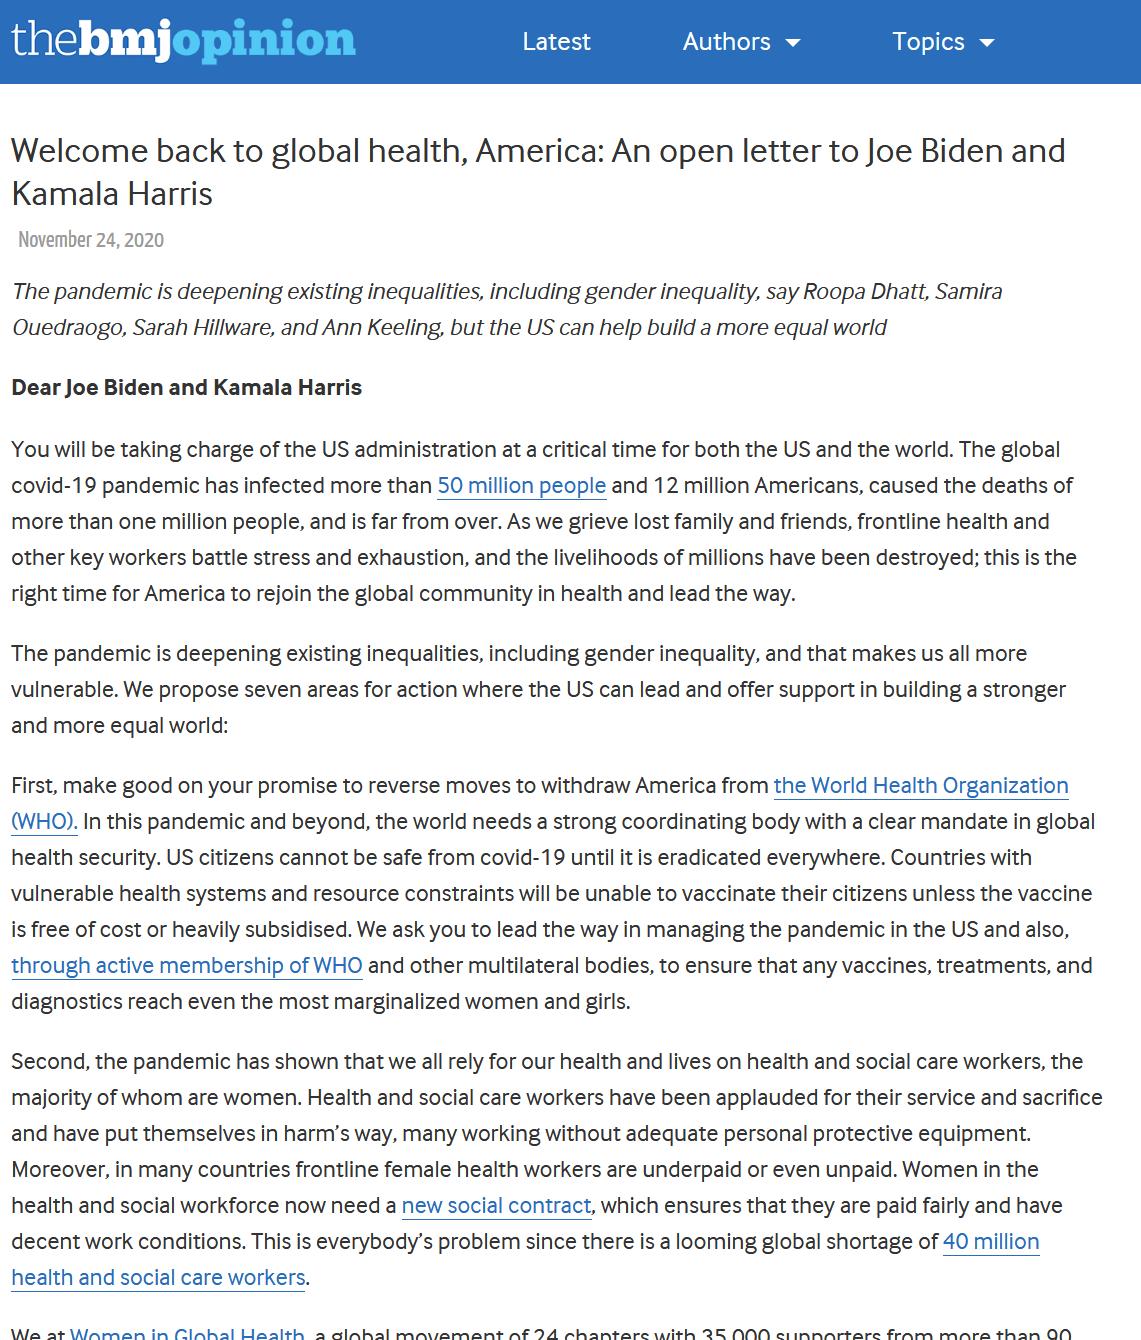 Welcome back to global health, America: An open letter to Joe Biden and Kamala Harris